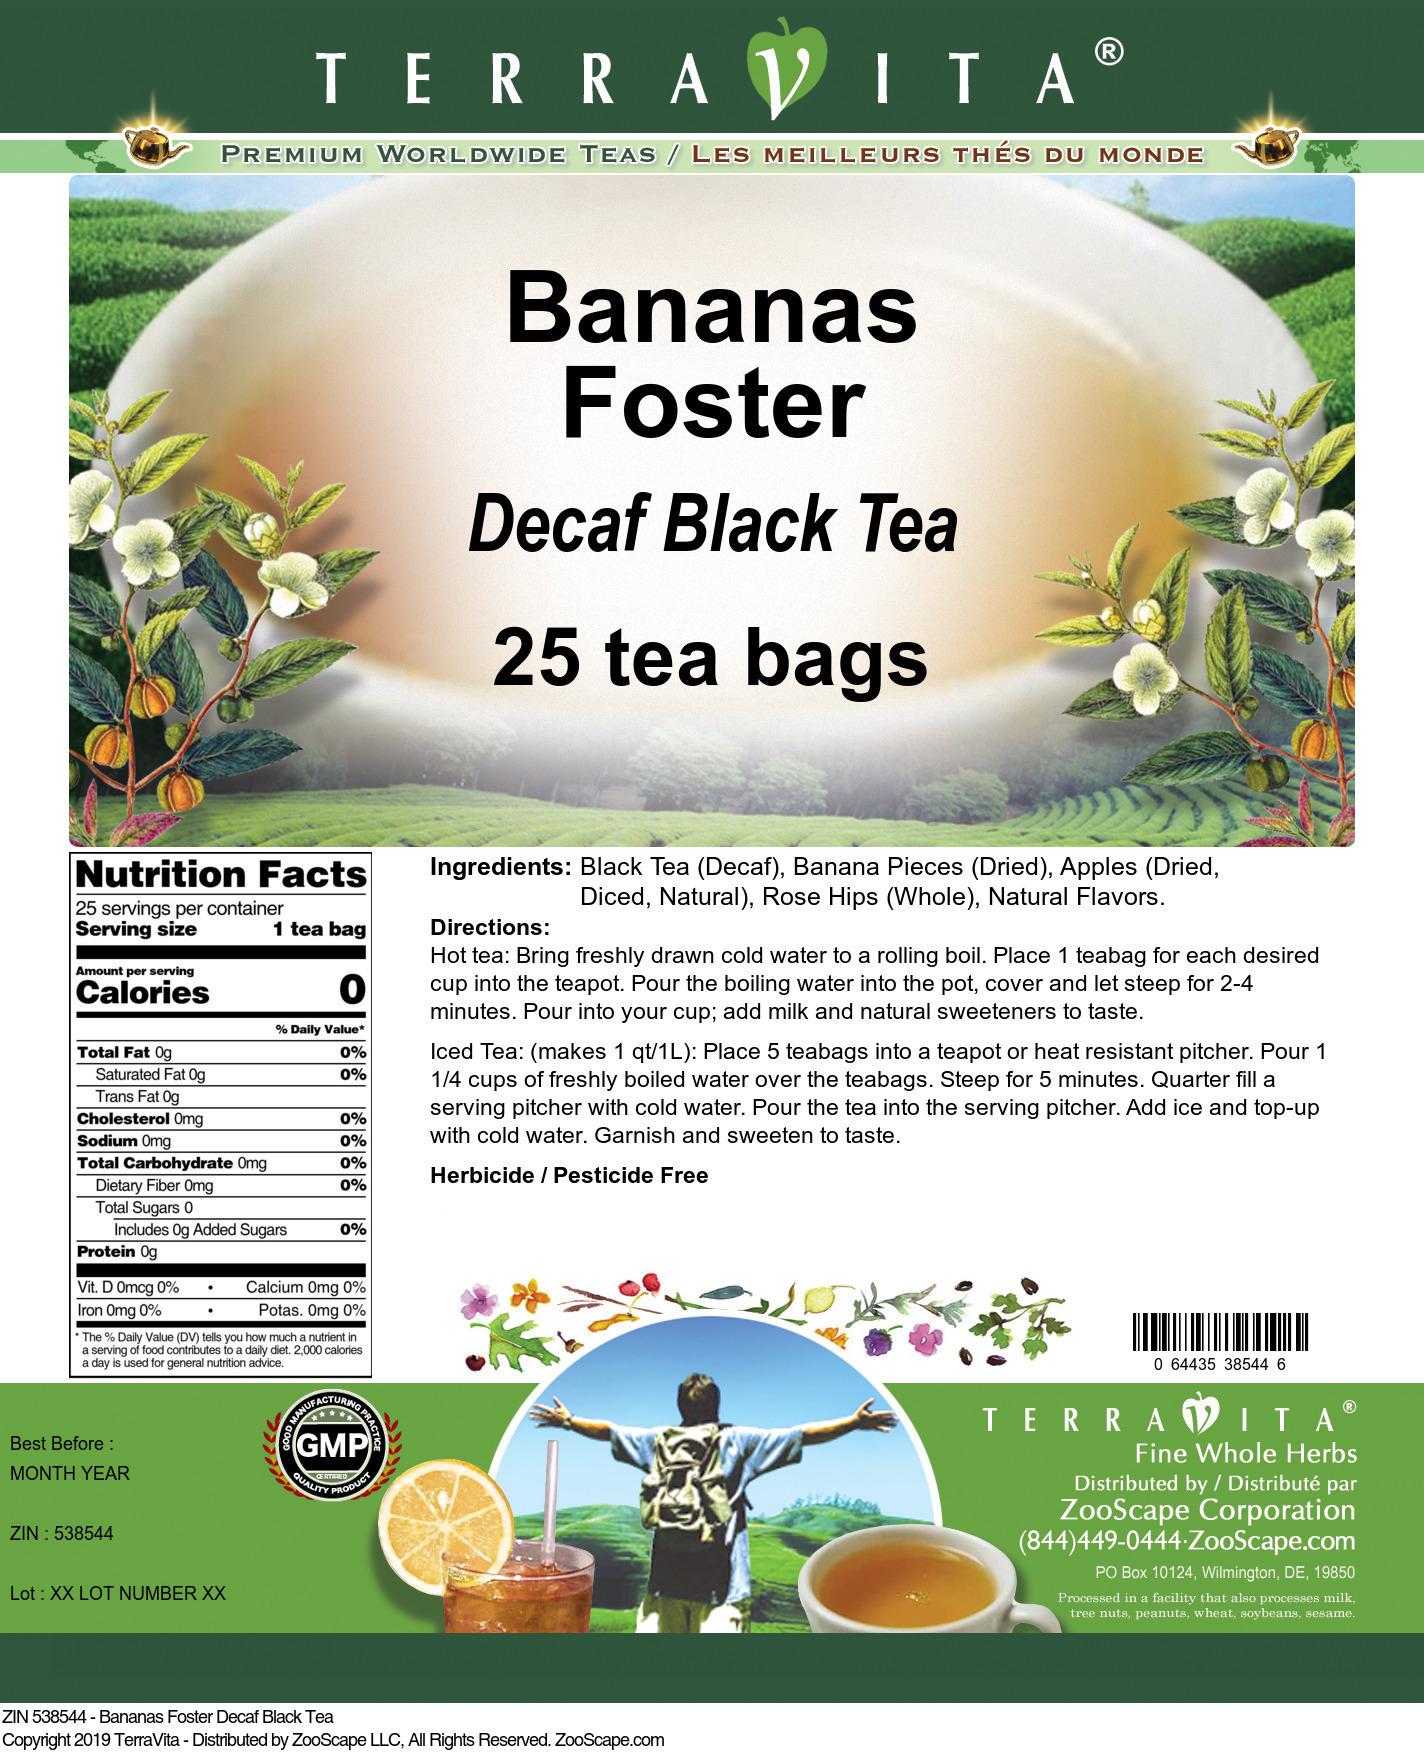 Bananas Foster Decaf Black Tea